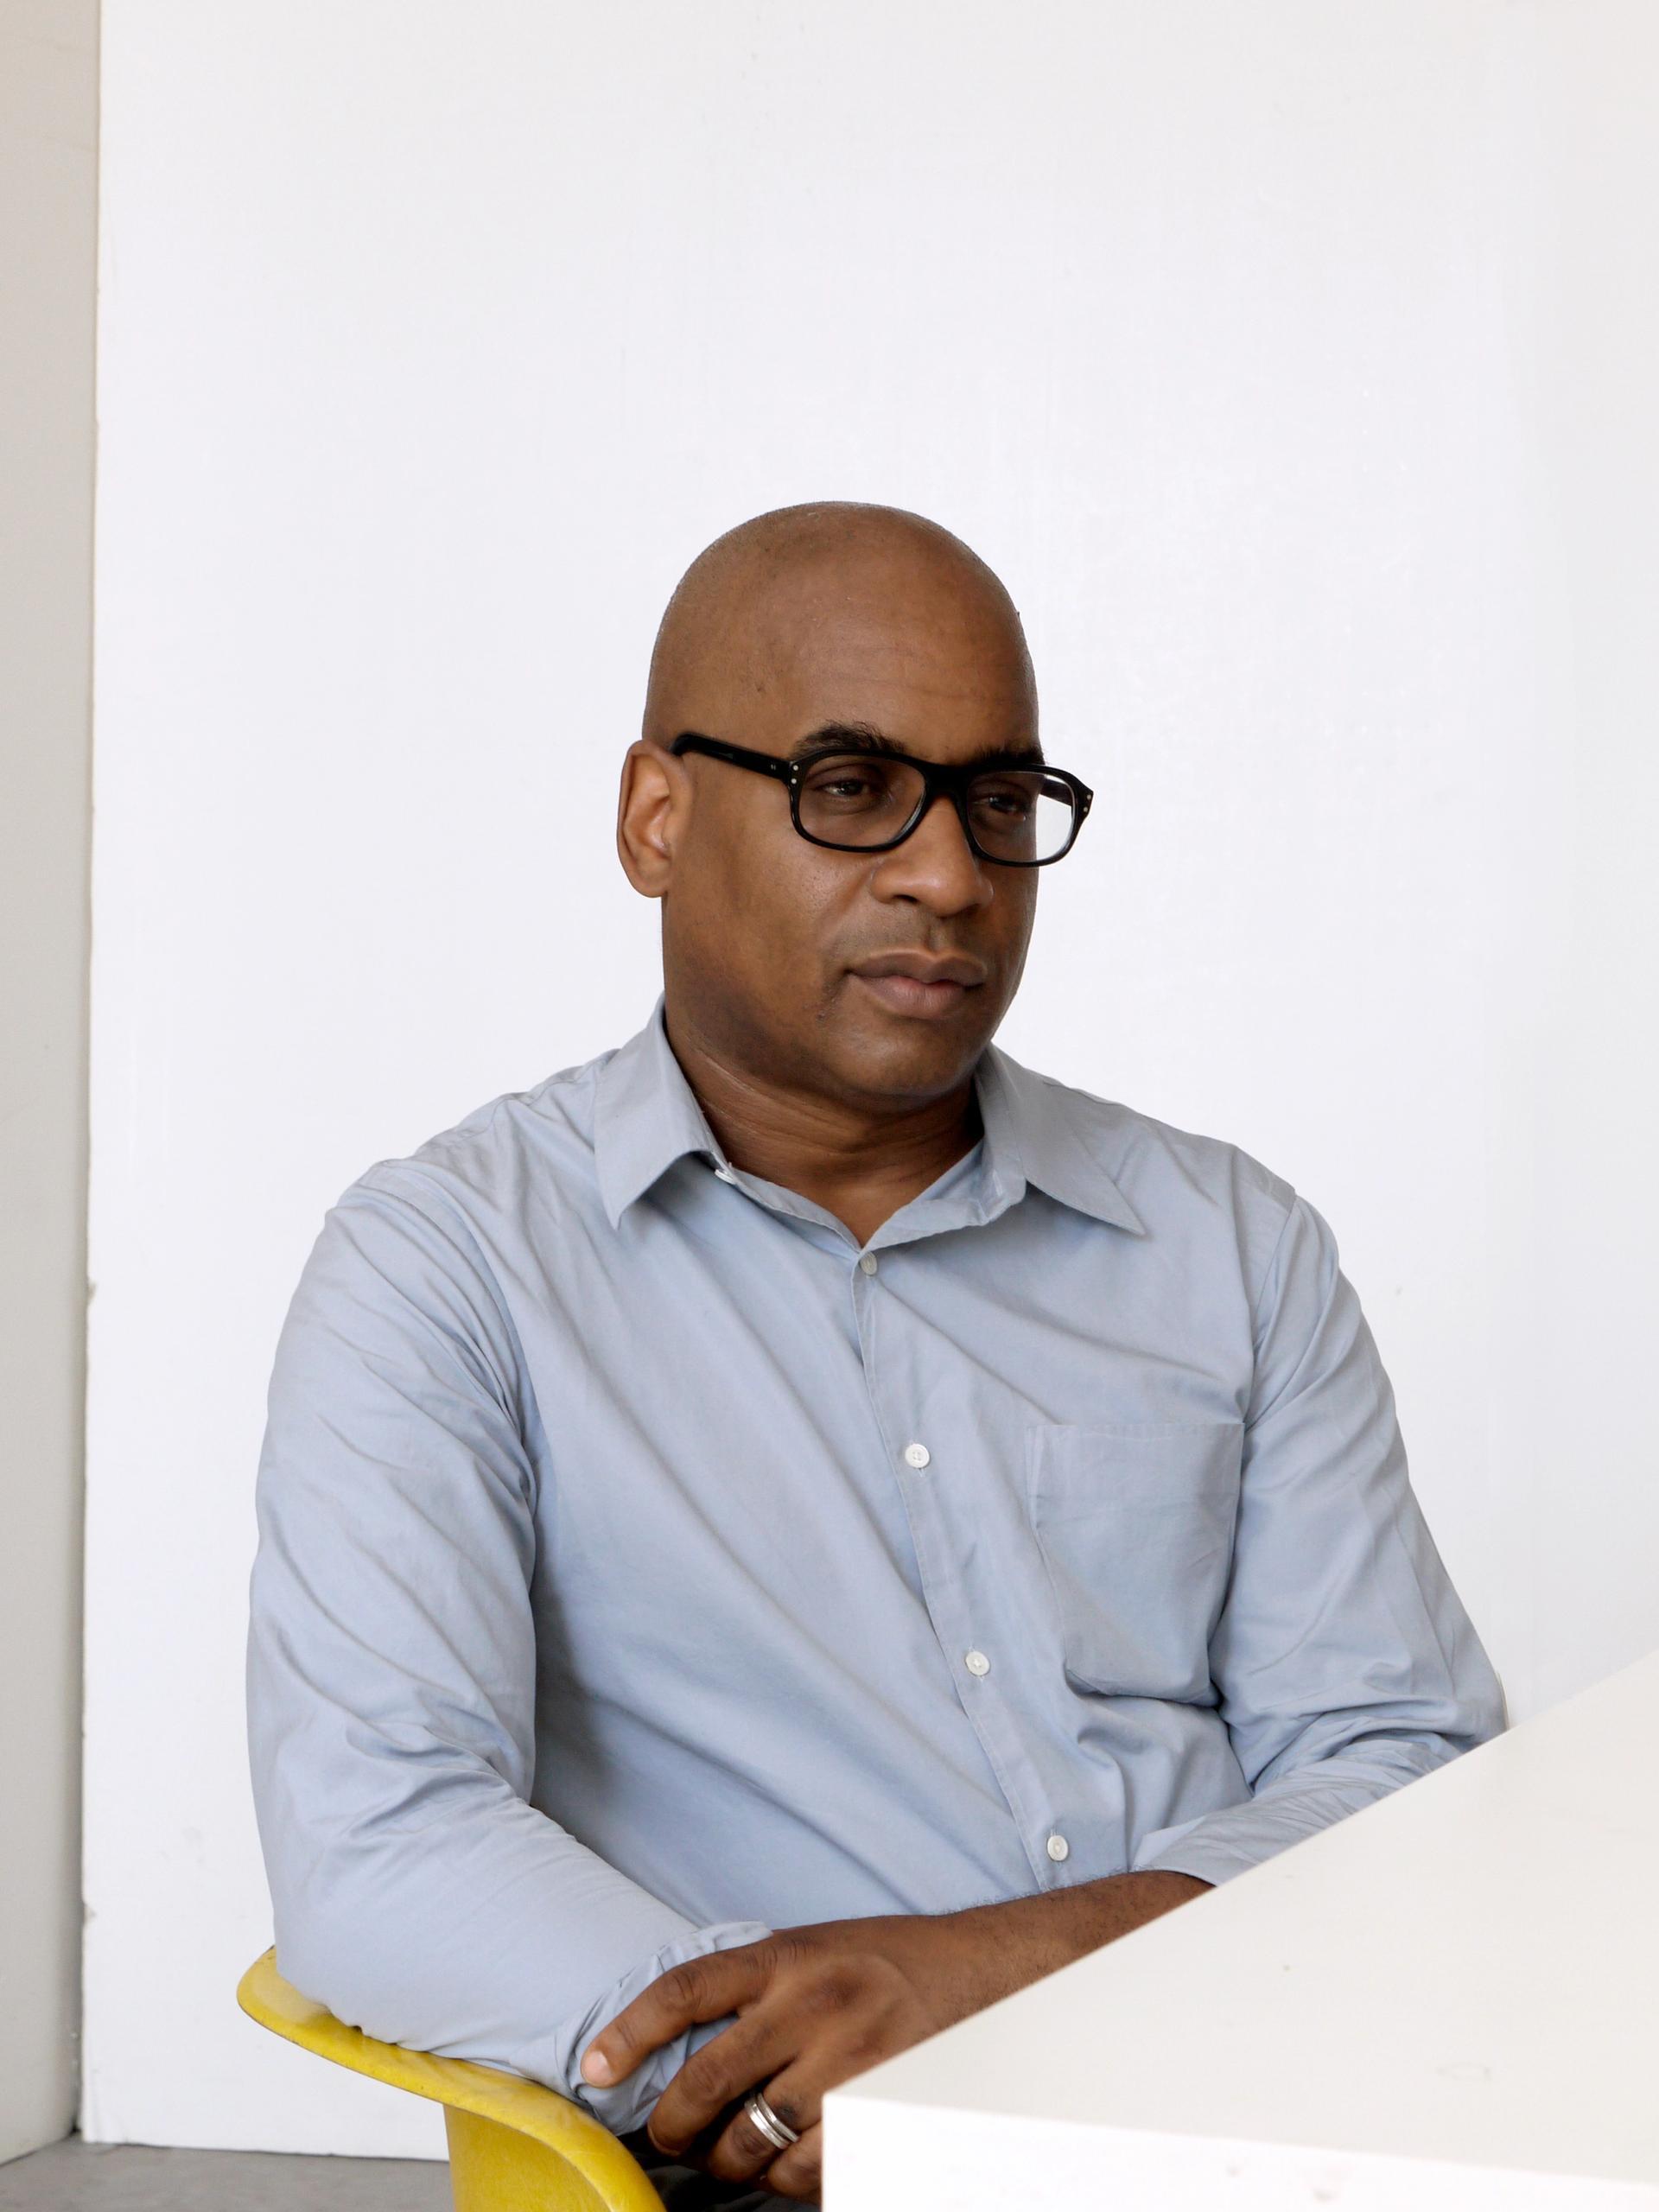 Portrait of Glenn Ligon Photo: Paul Mpagi Sepuya. Courtesy the artist and Hauser & Wirth